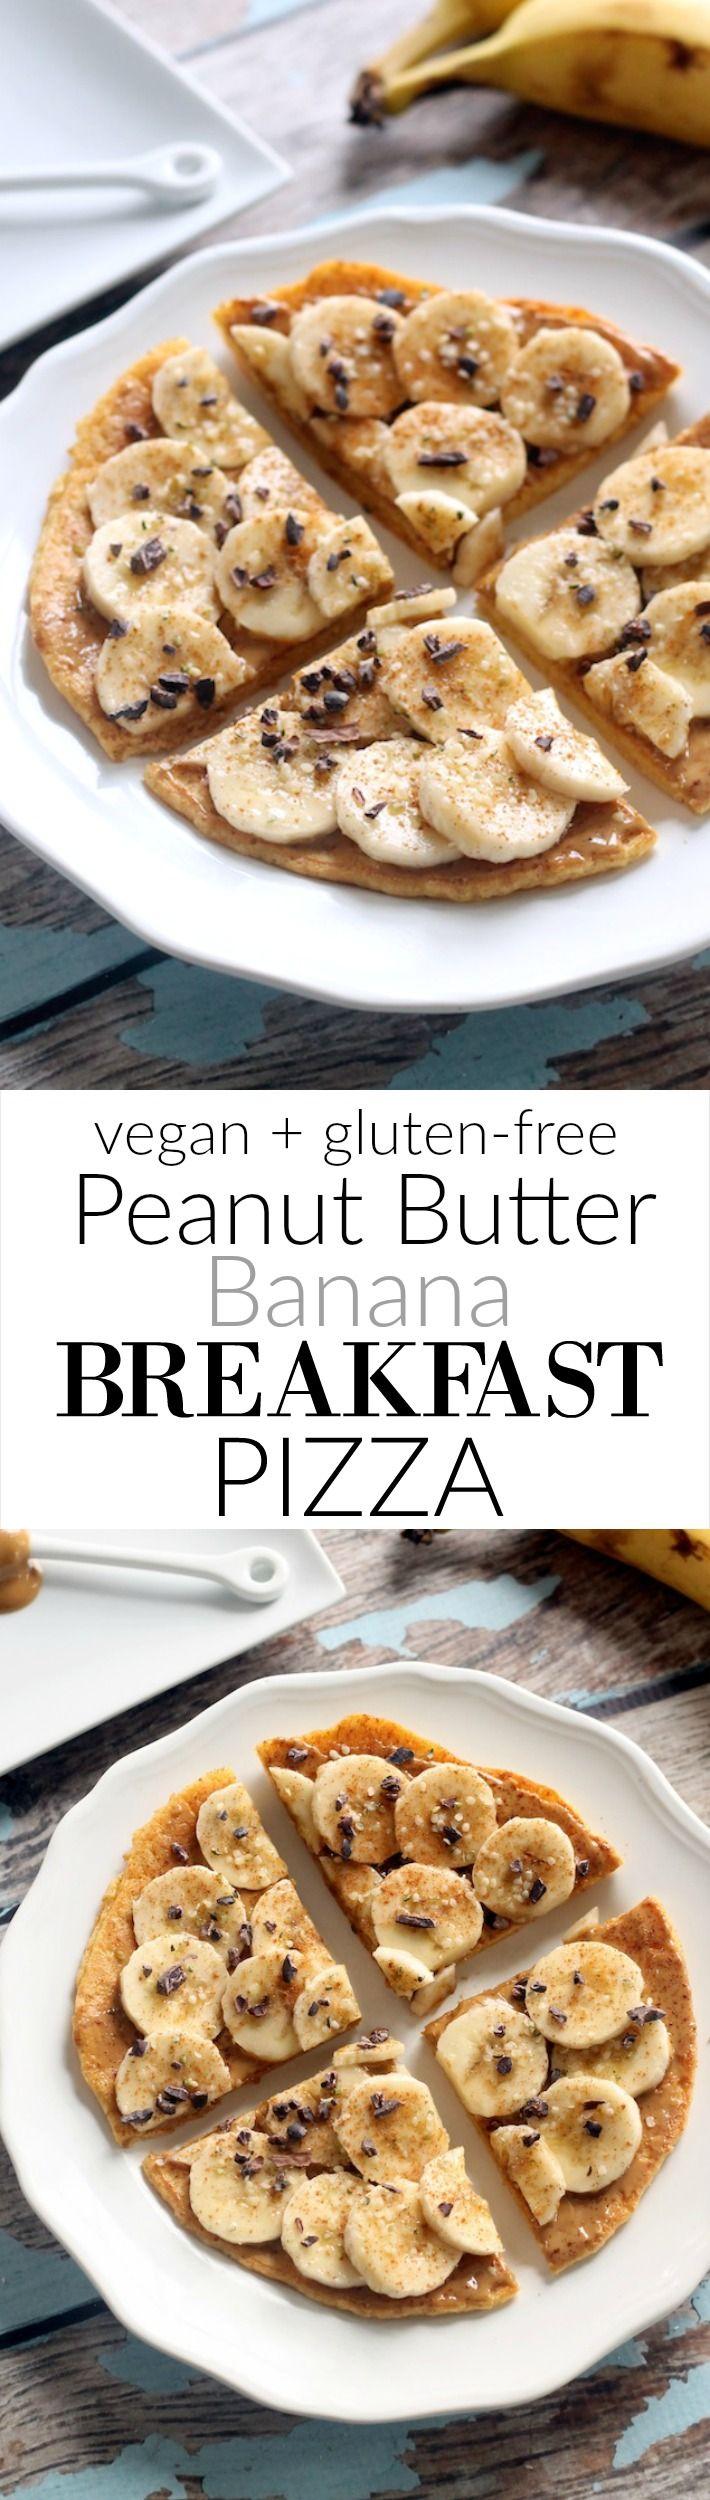 Recipe // Banana + Almond Milk + Maple Syrup + Peanut Butter + Chickpea Flour + Cinnamon + Vanilla